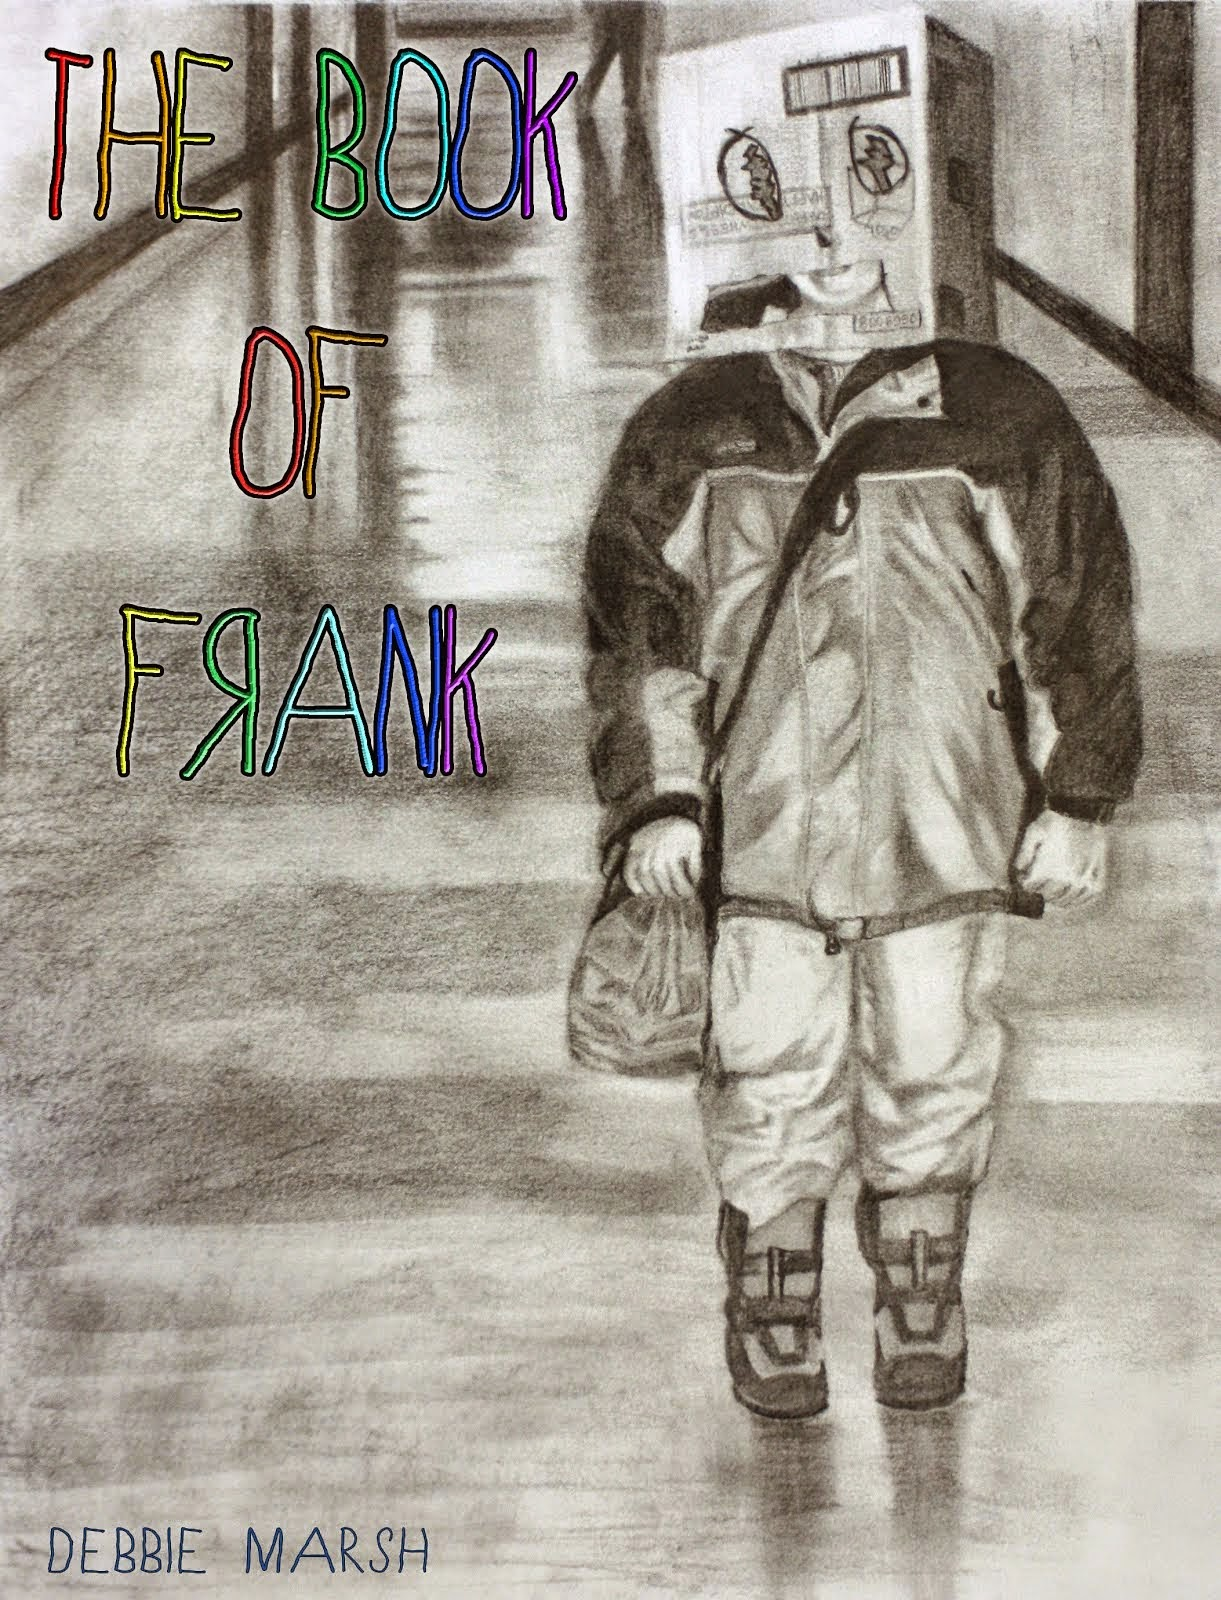 http://www.amazon.com/Book-Frank-Lessons-Learned-Kindergarten/dp/1500411213/ref=sr_1_1?ie=UTF8&qid=1416845107&sr=8-1&keywords=The+Book+of+Frank+Debbie+Marsh